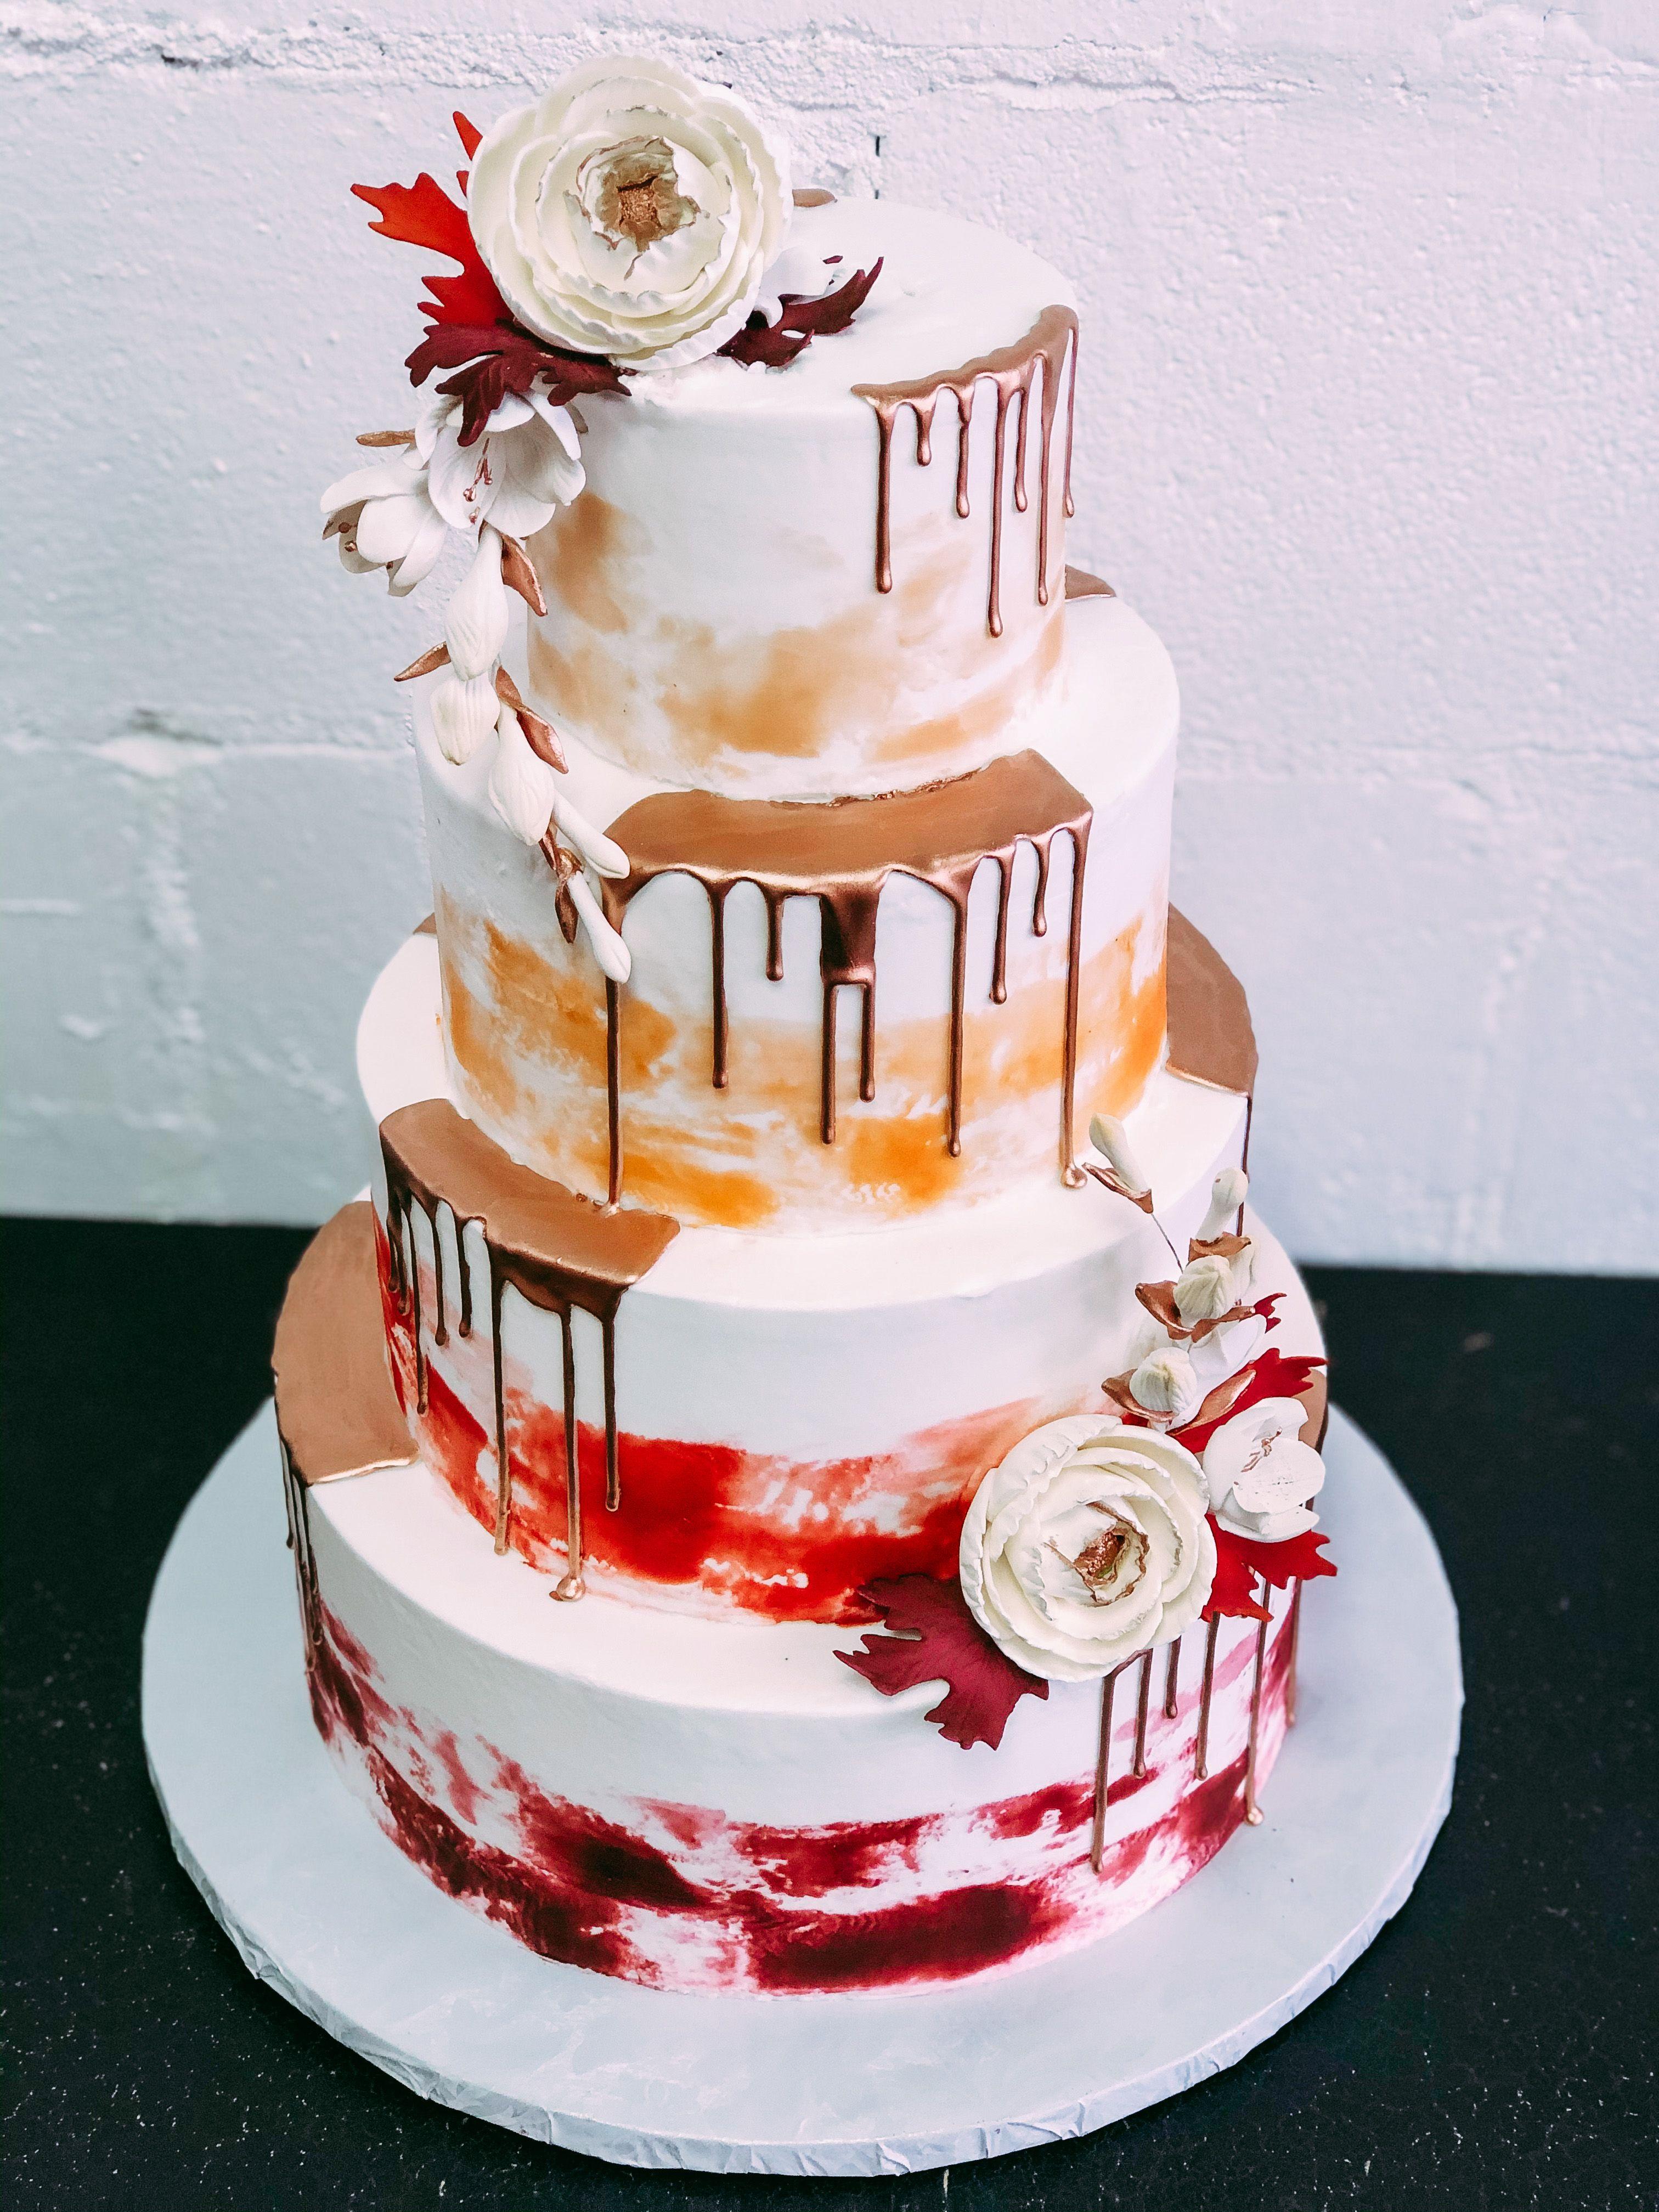 Drip cake - Cake by Wilmas Droomtaarten - CakesDecor